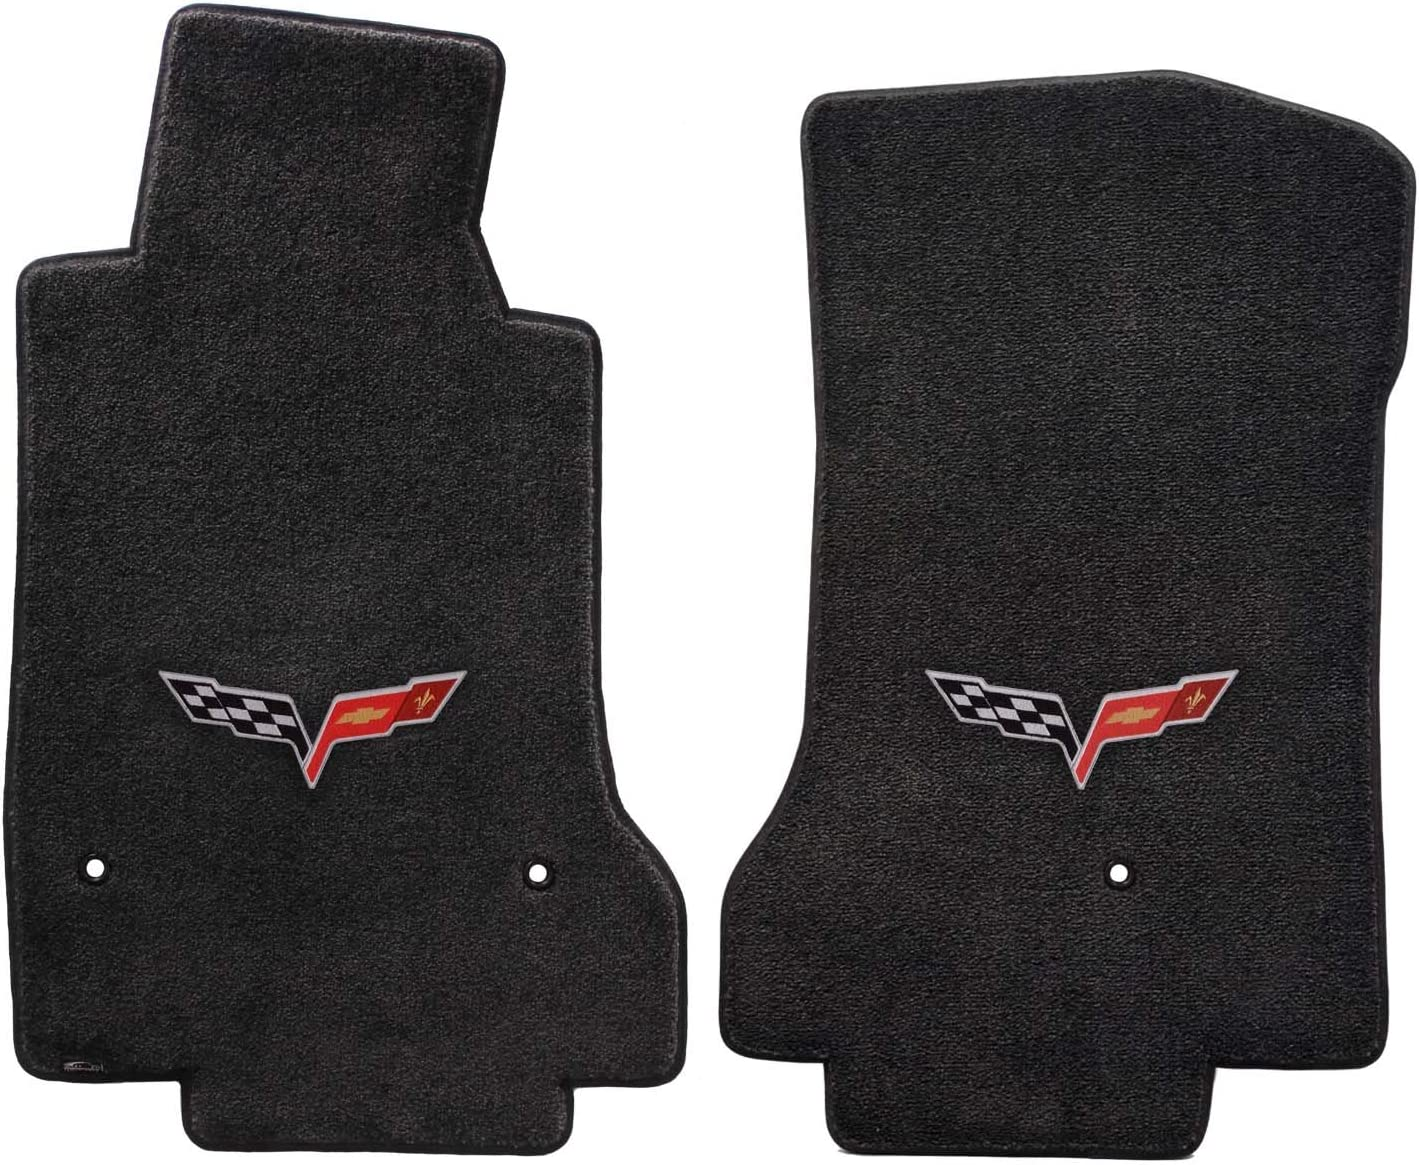 Fits 2007.5-2013 C6 Corvette Driver & Passenger Floor Mats Set; Black / Ebony Velourtex Fabric with Crossed Flags Logo Embroidery